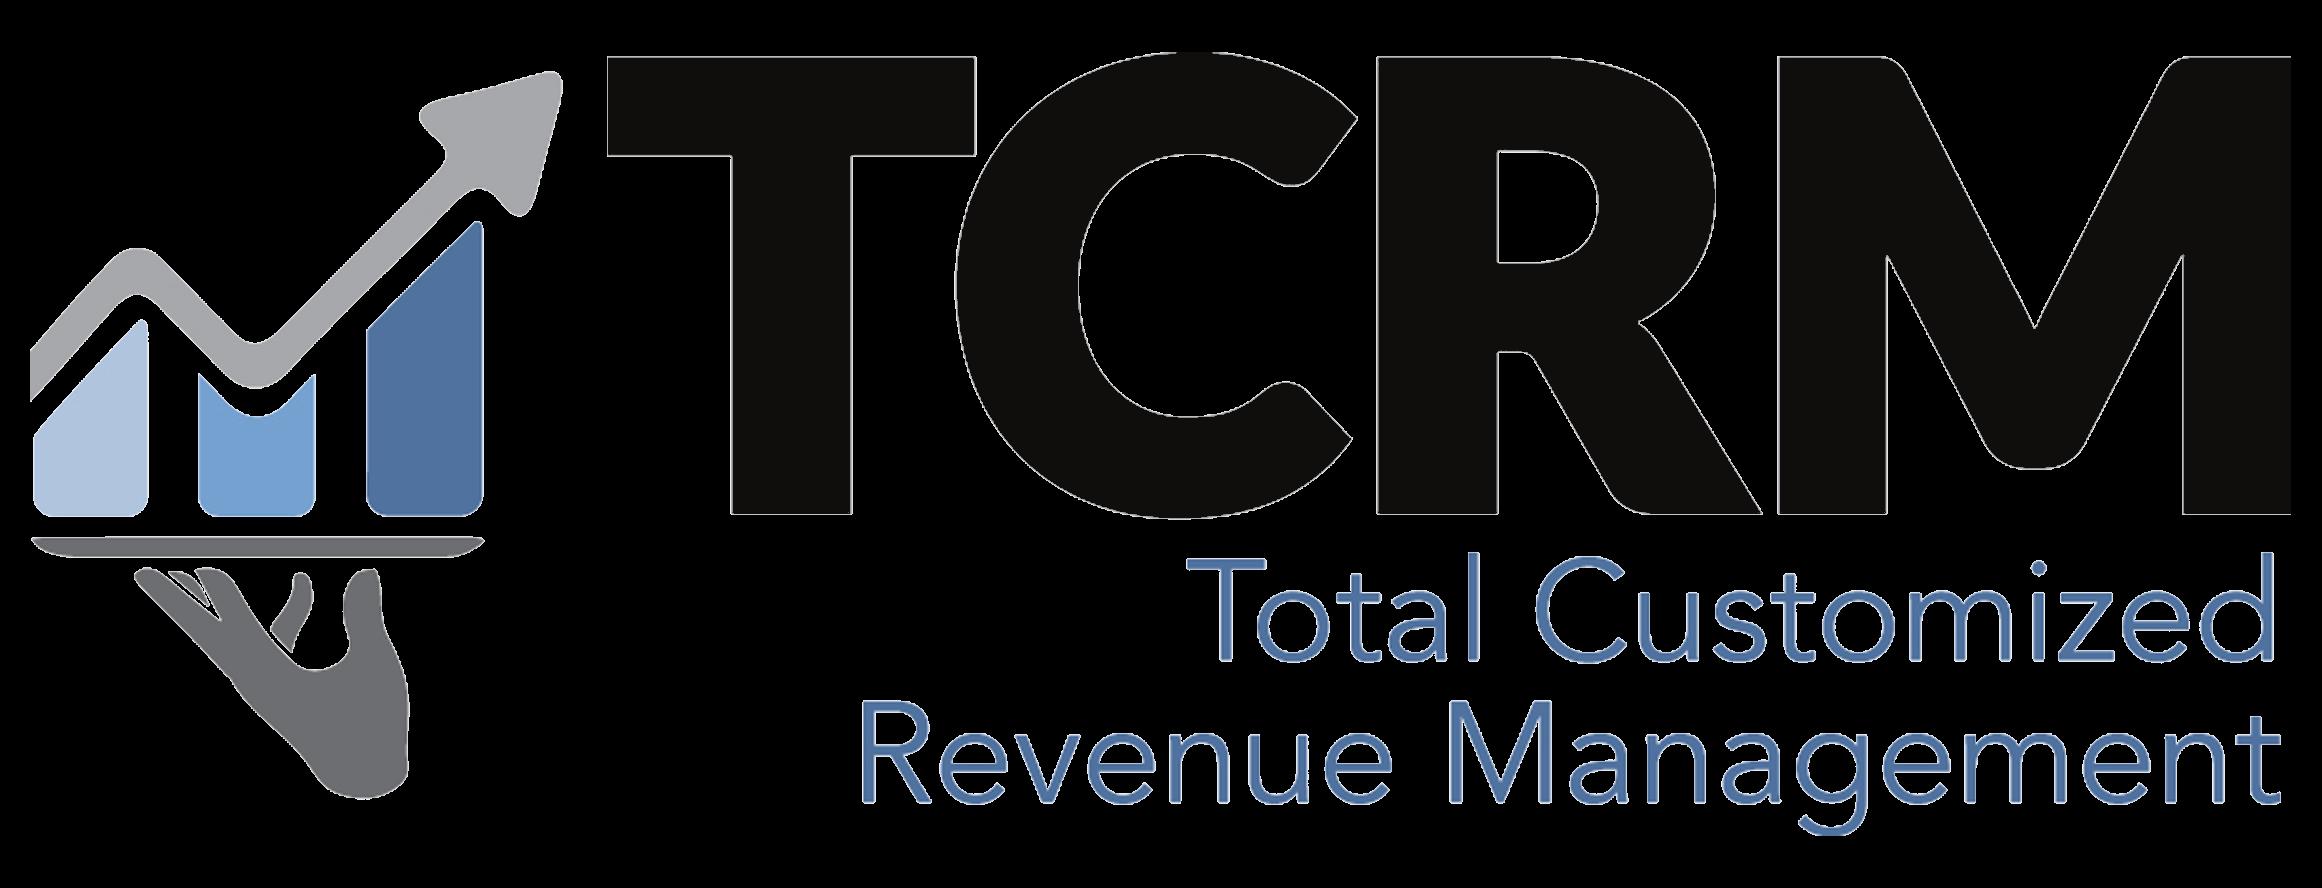 Total Customized Revenue Management